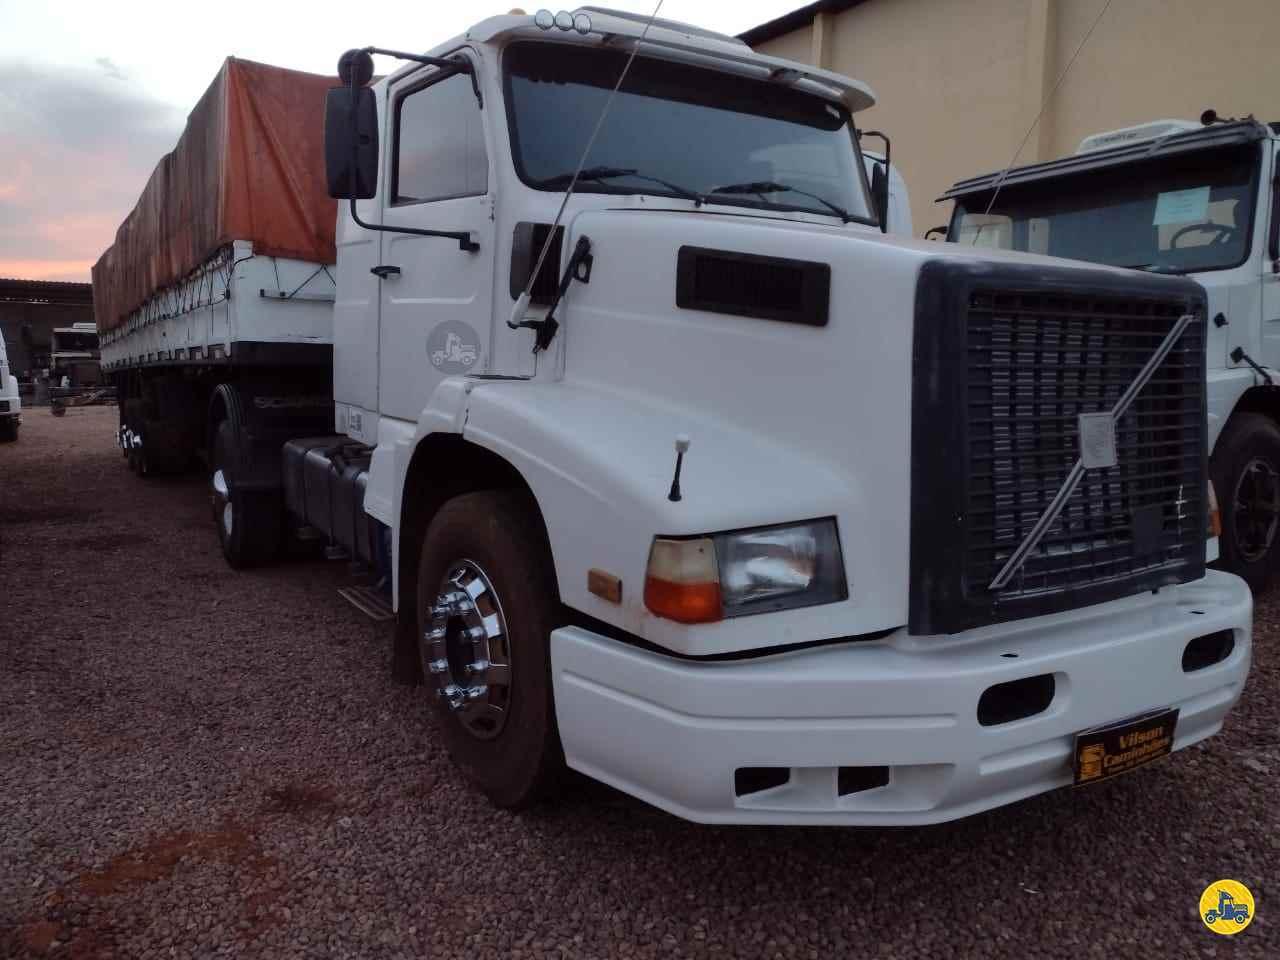 CAMINHAO VOLVO VOLVO NL10 340 Cavalo Mecânico Truck 6x2 Vilson Caminhões  RONDONOPOLIS MATO GROSSO MT